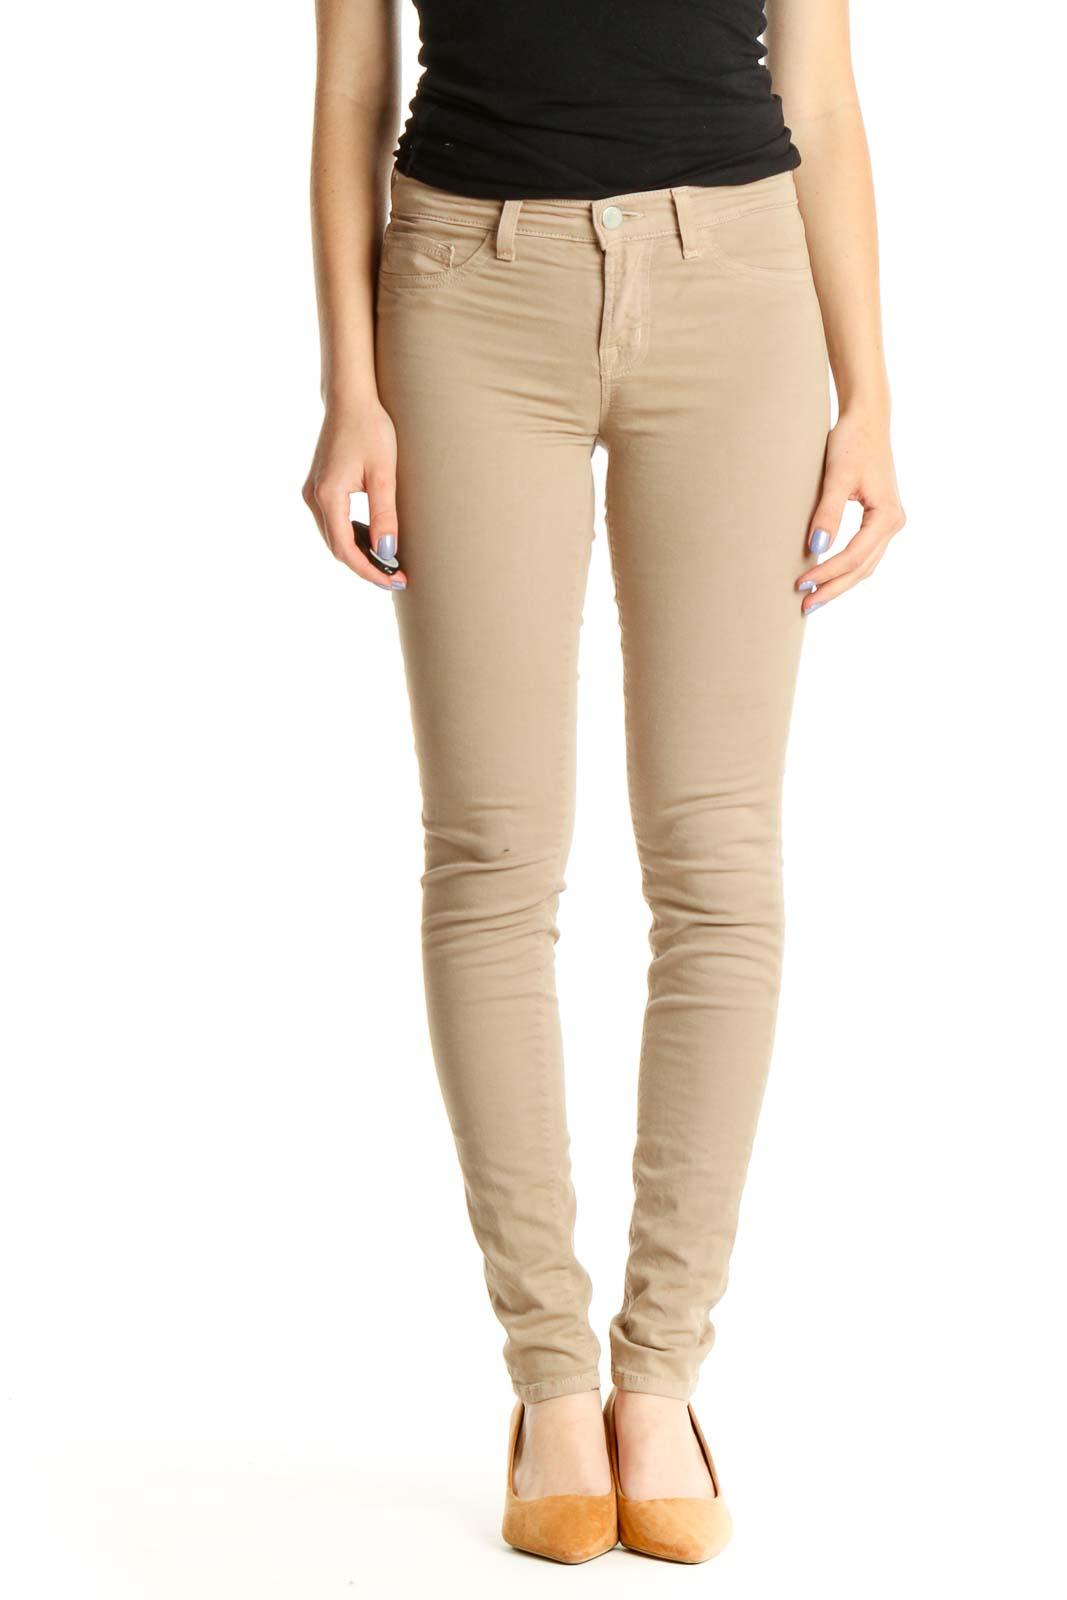 Beige Skinny Jeans Front